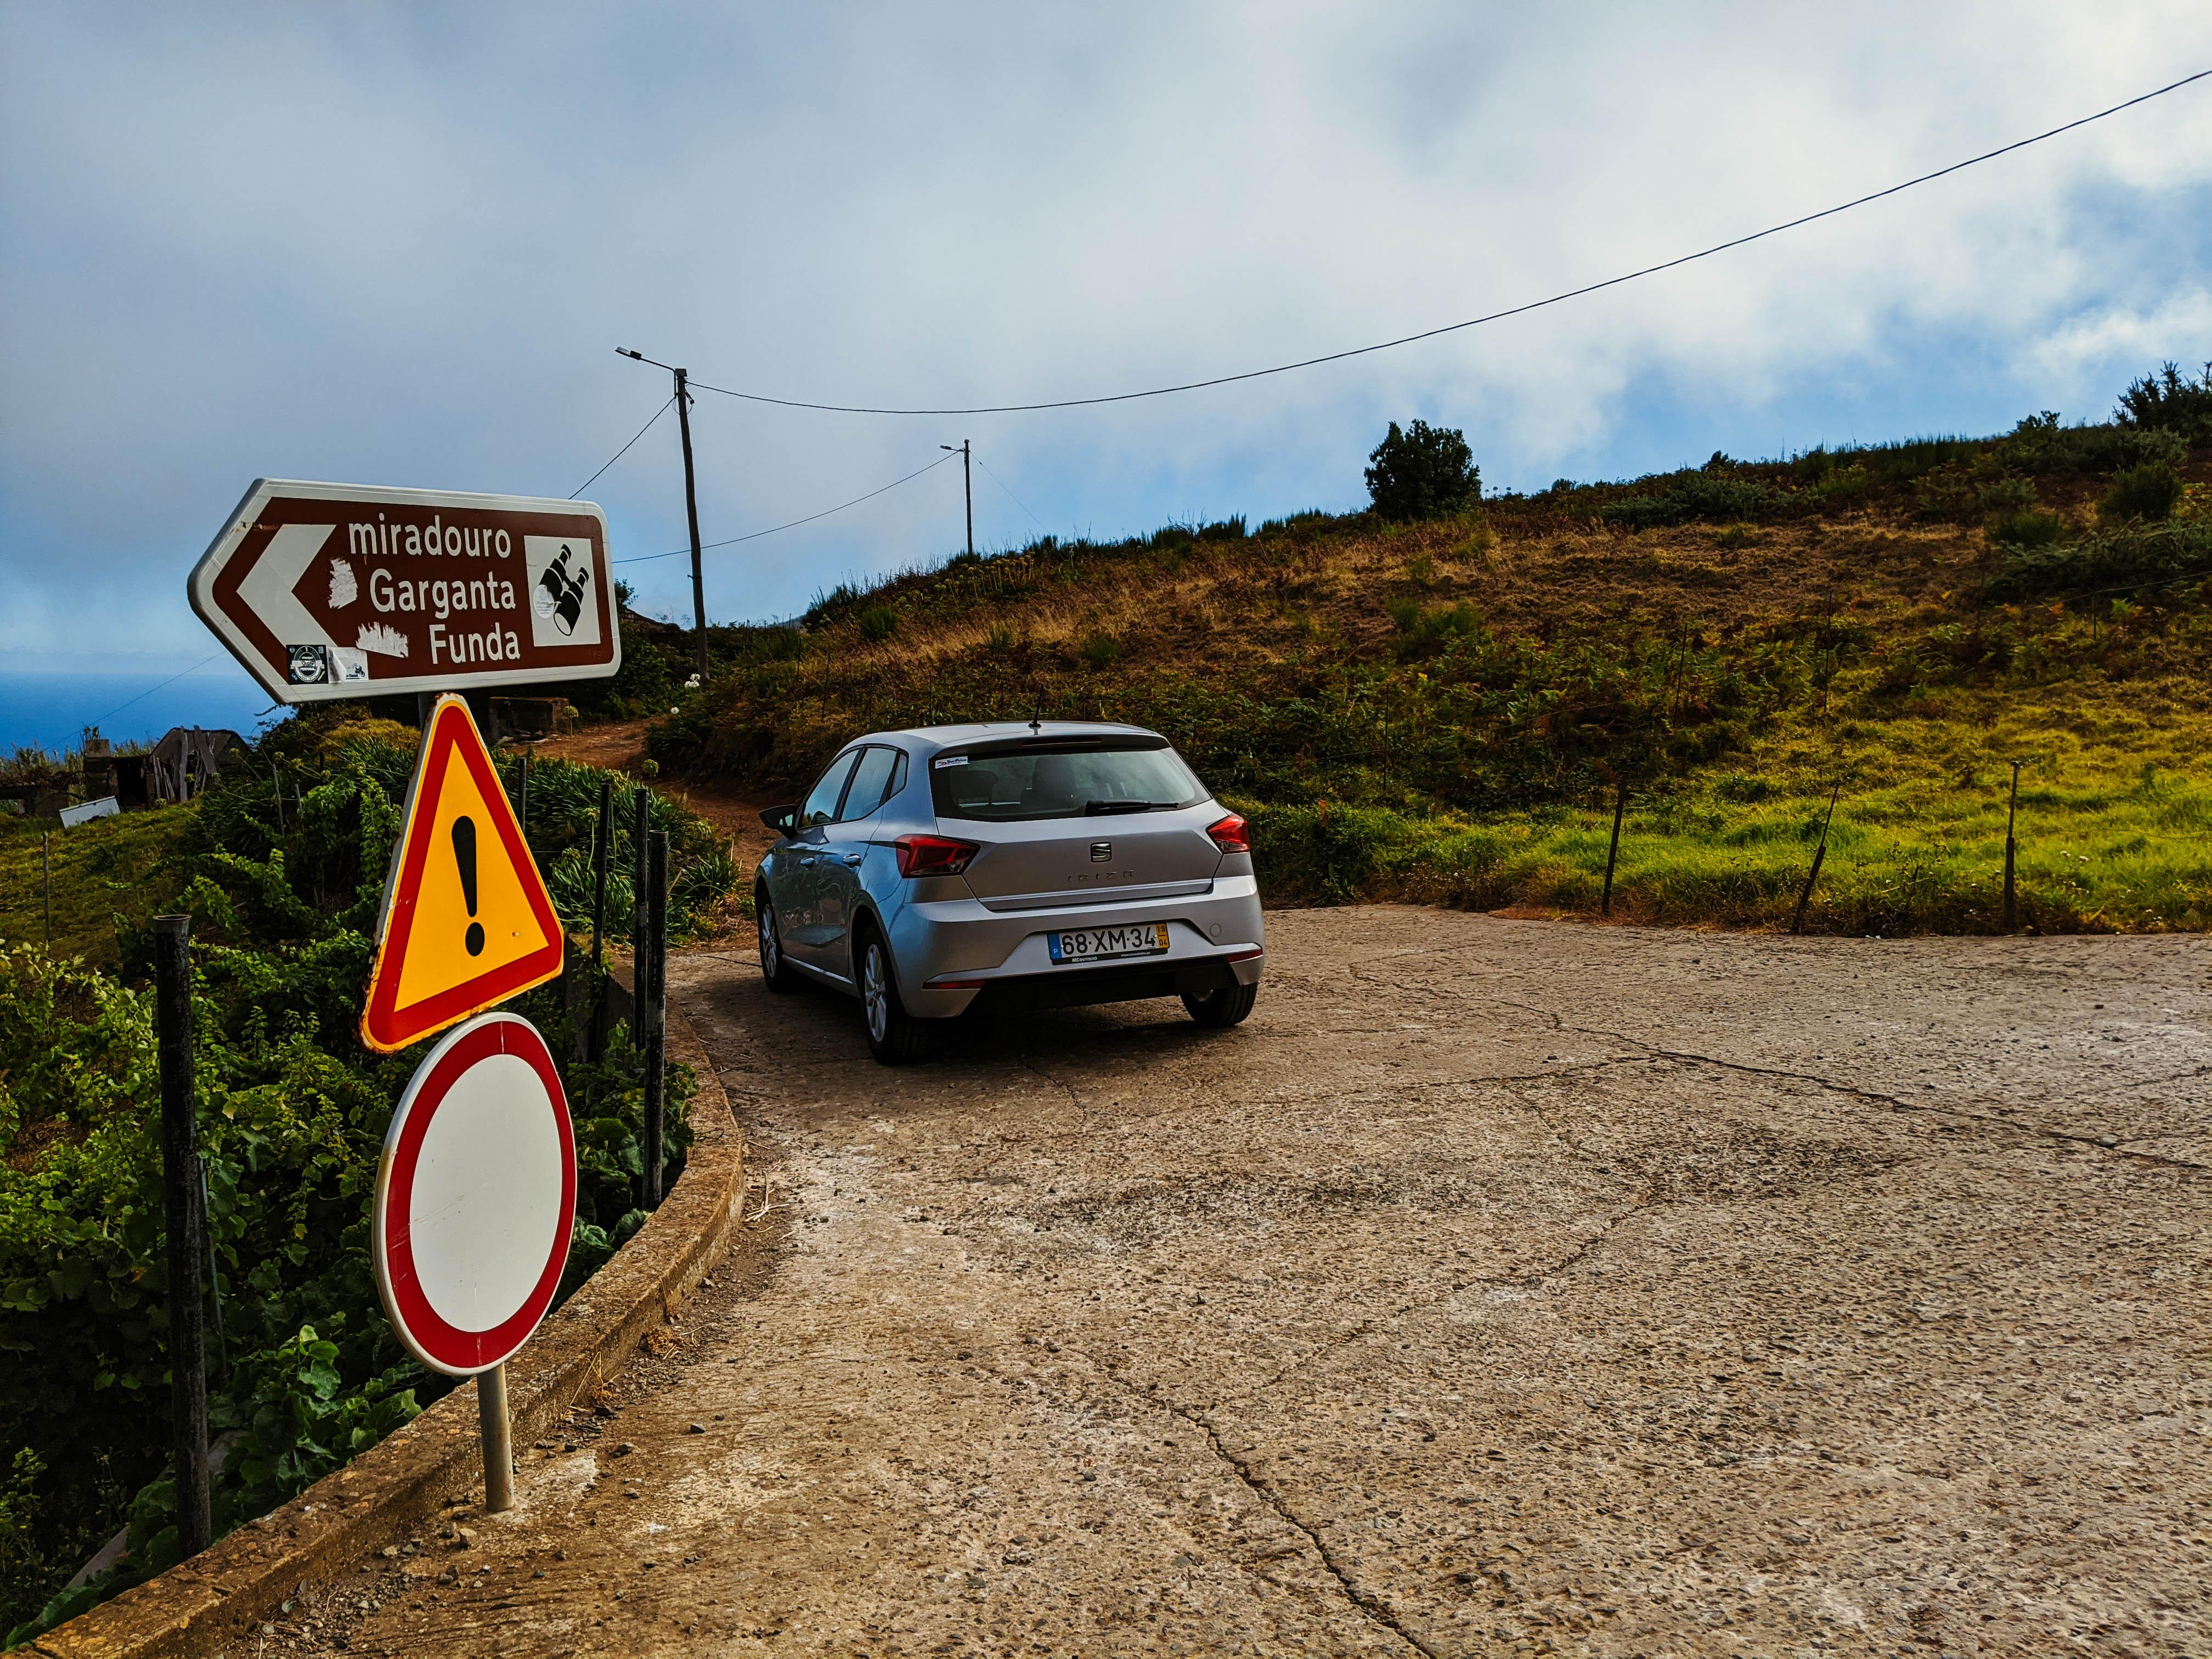 Ibiza 3km Road Sign